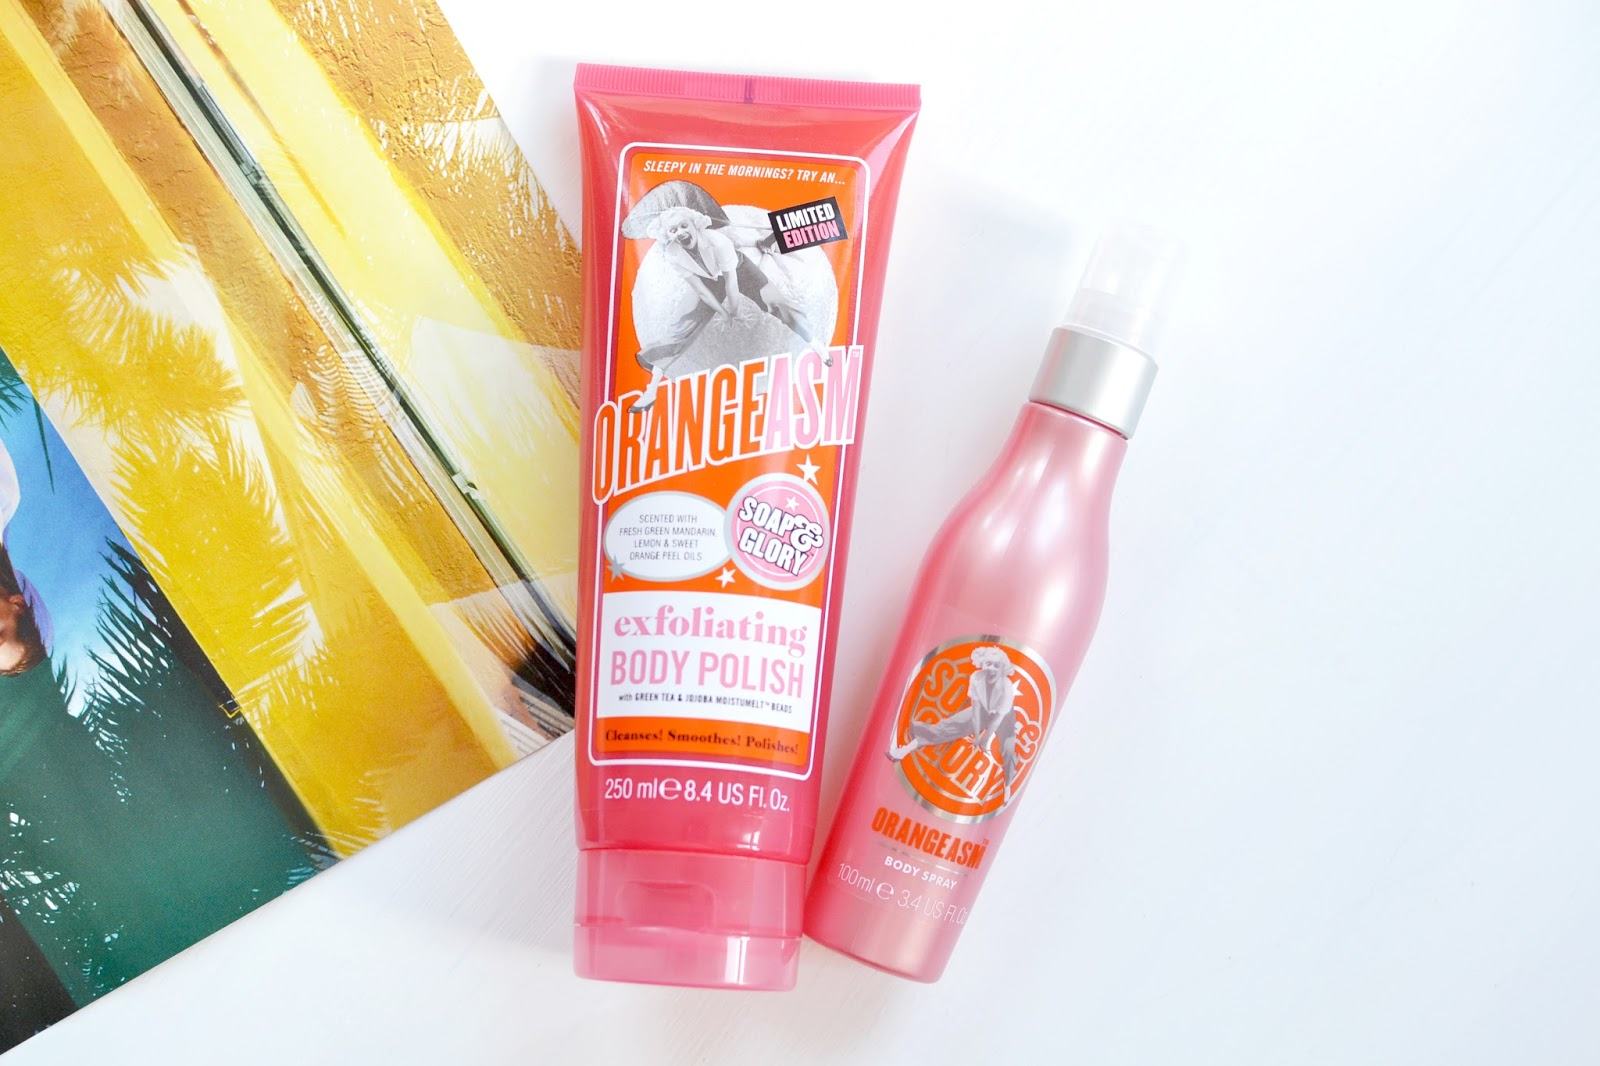 Soap&Glory orangeasm